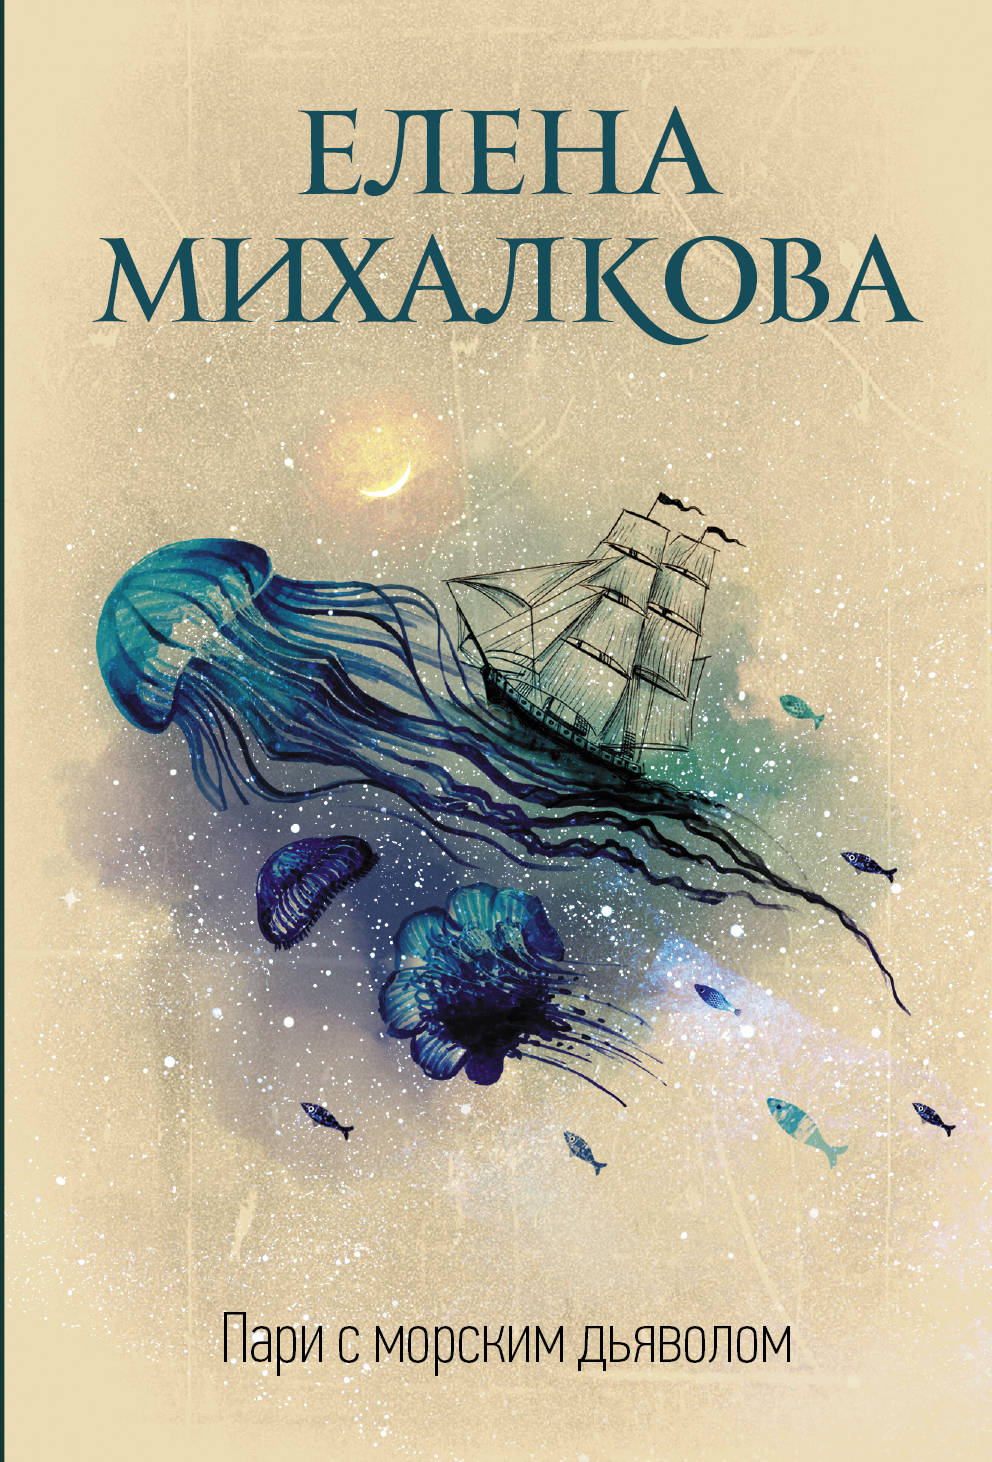 Пари с морским дьяволом: Роман